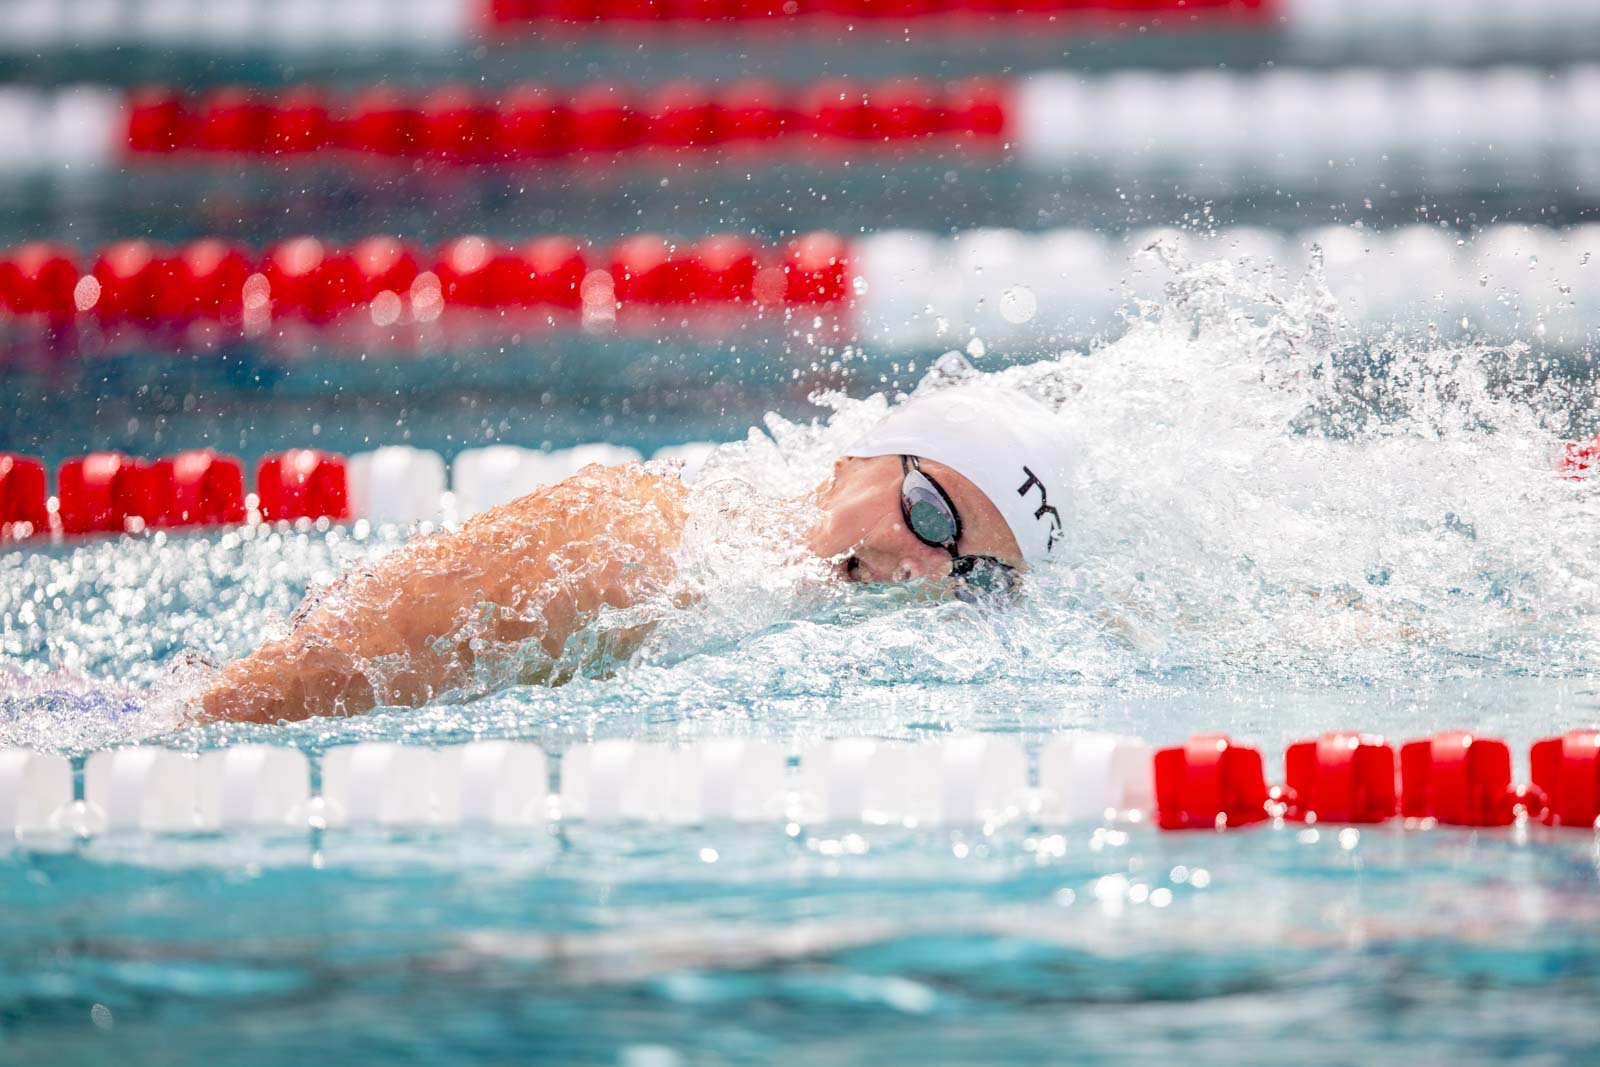 Katie Ledecky Cruises to Knoxville Pro Swim Series 1500 Win - Swimming World News